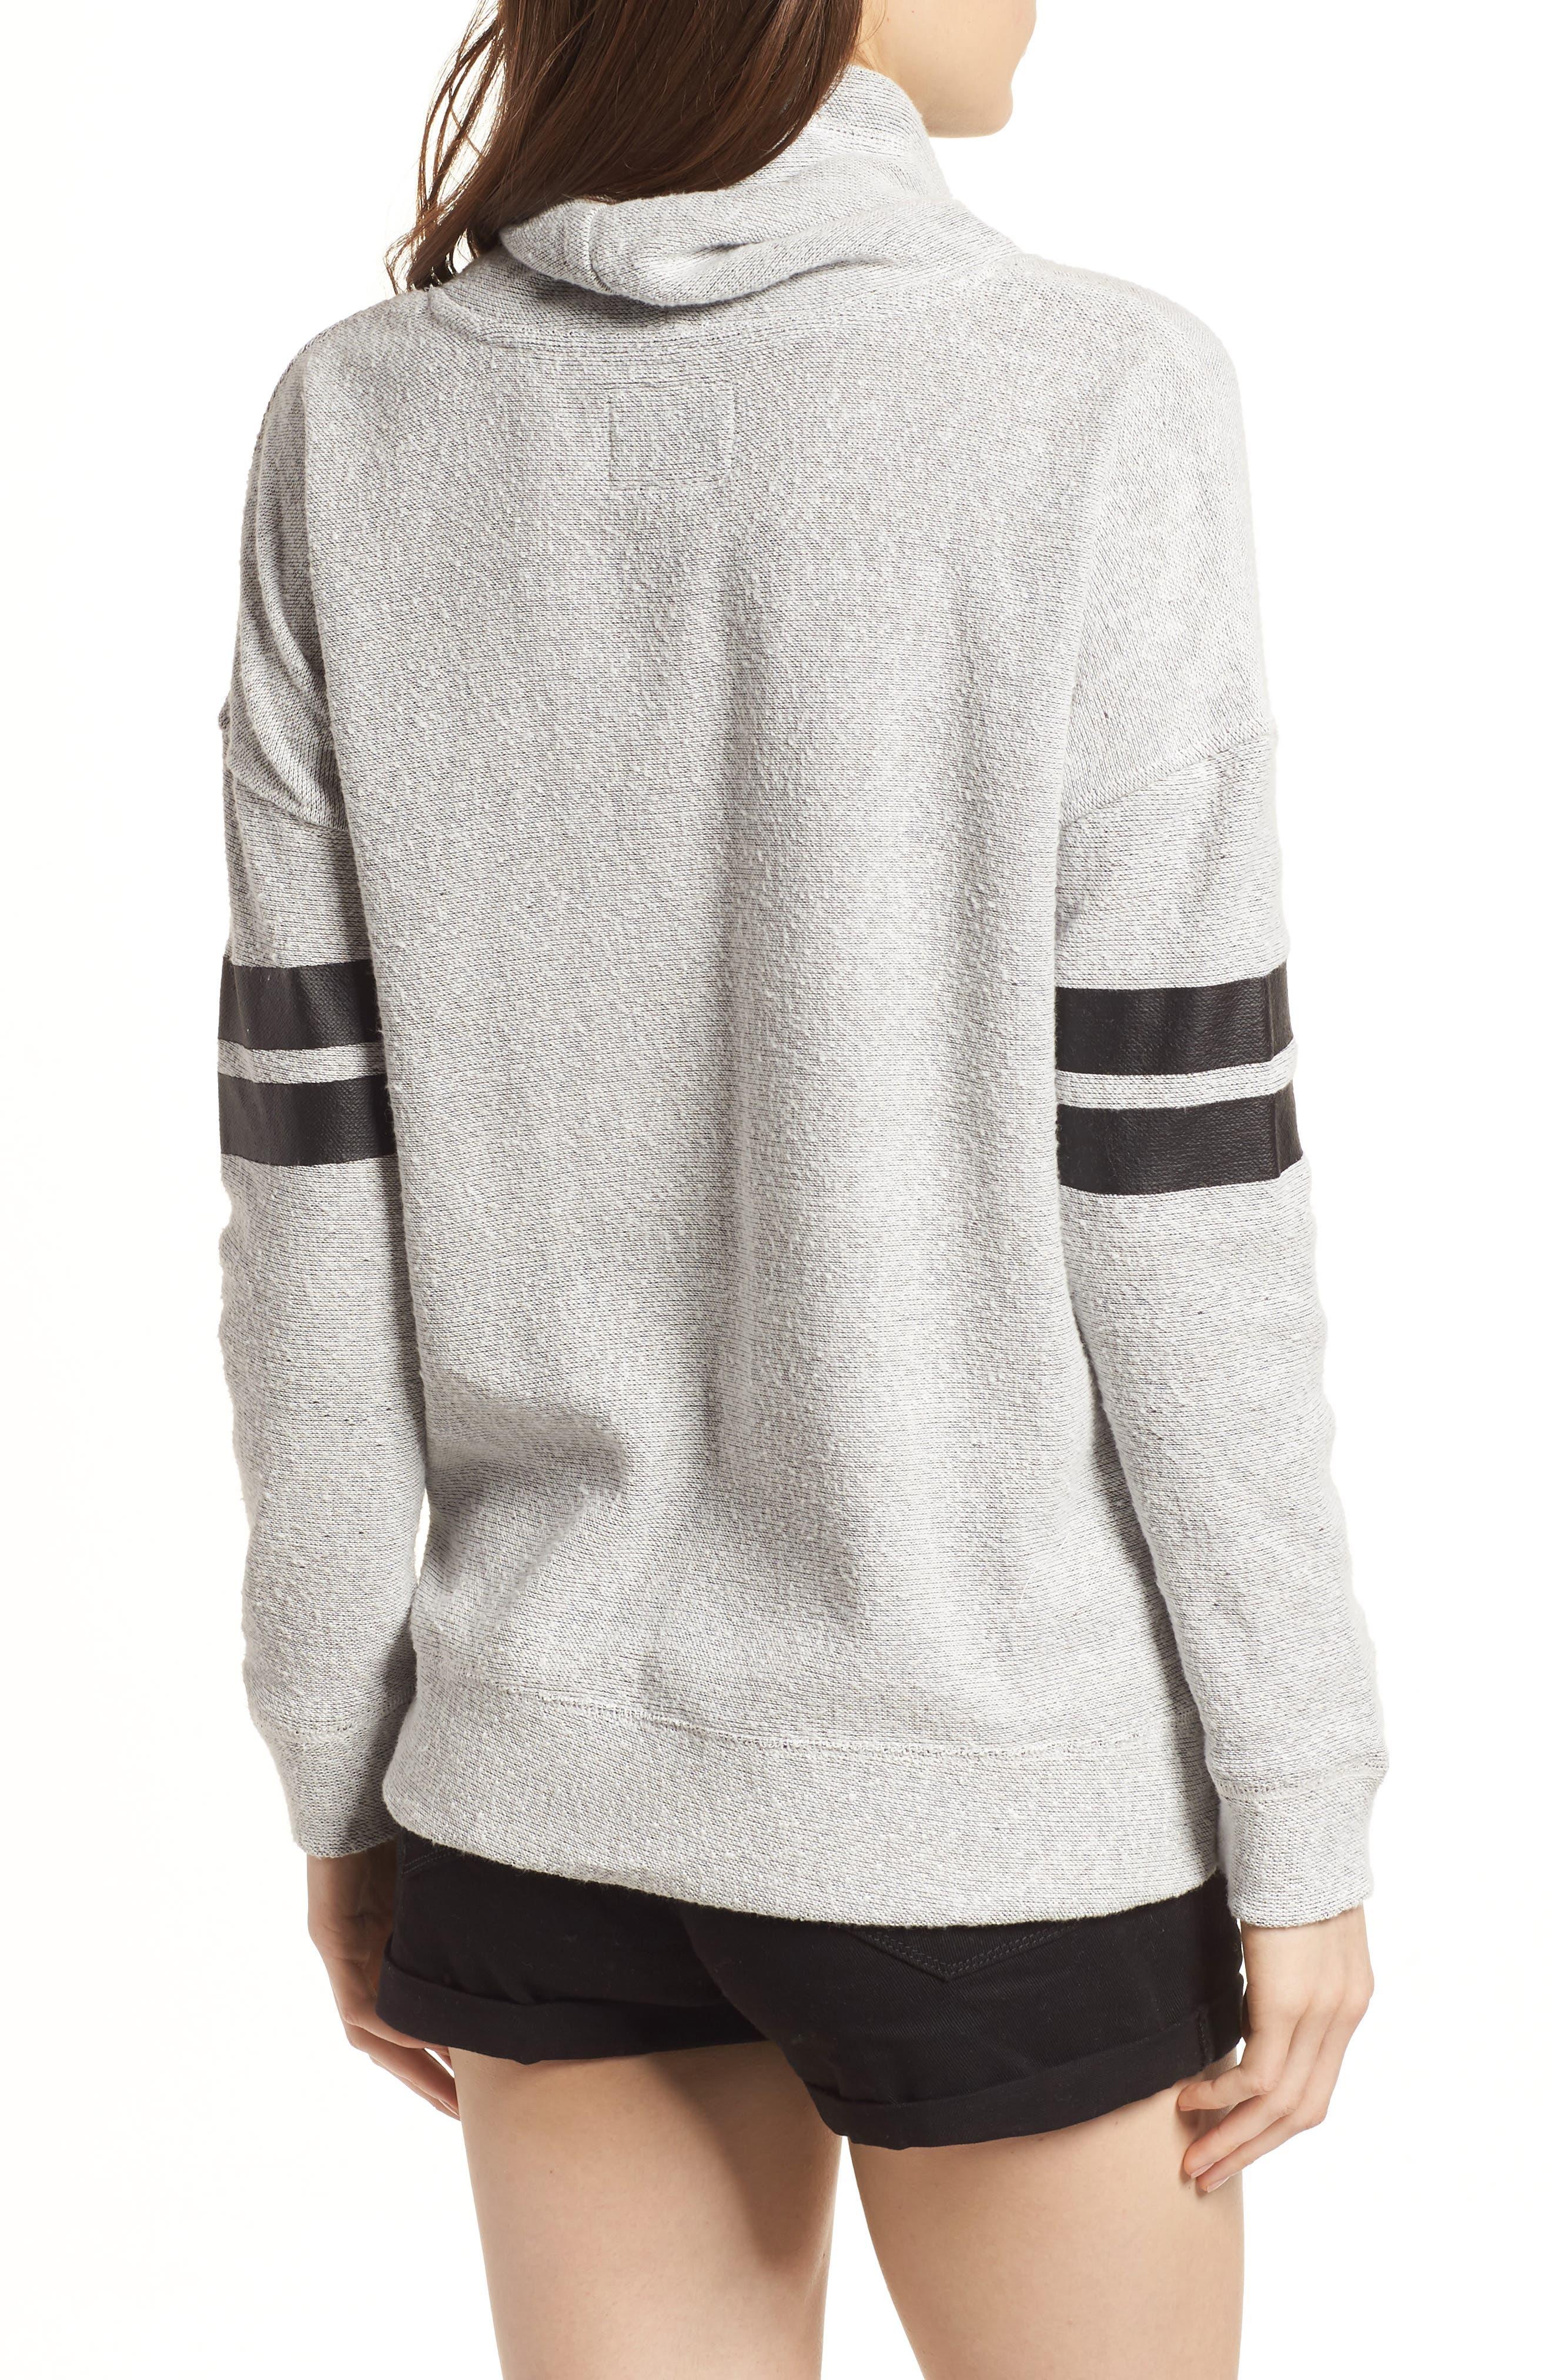 Offsides San Francisco Giants Funnel Neck Sweatshirt,                             Alternate thumbnail 2, color,                             024